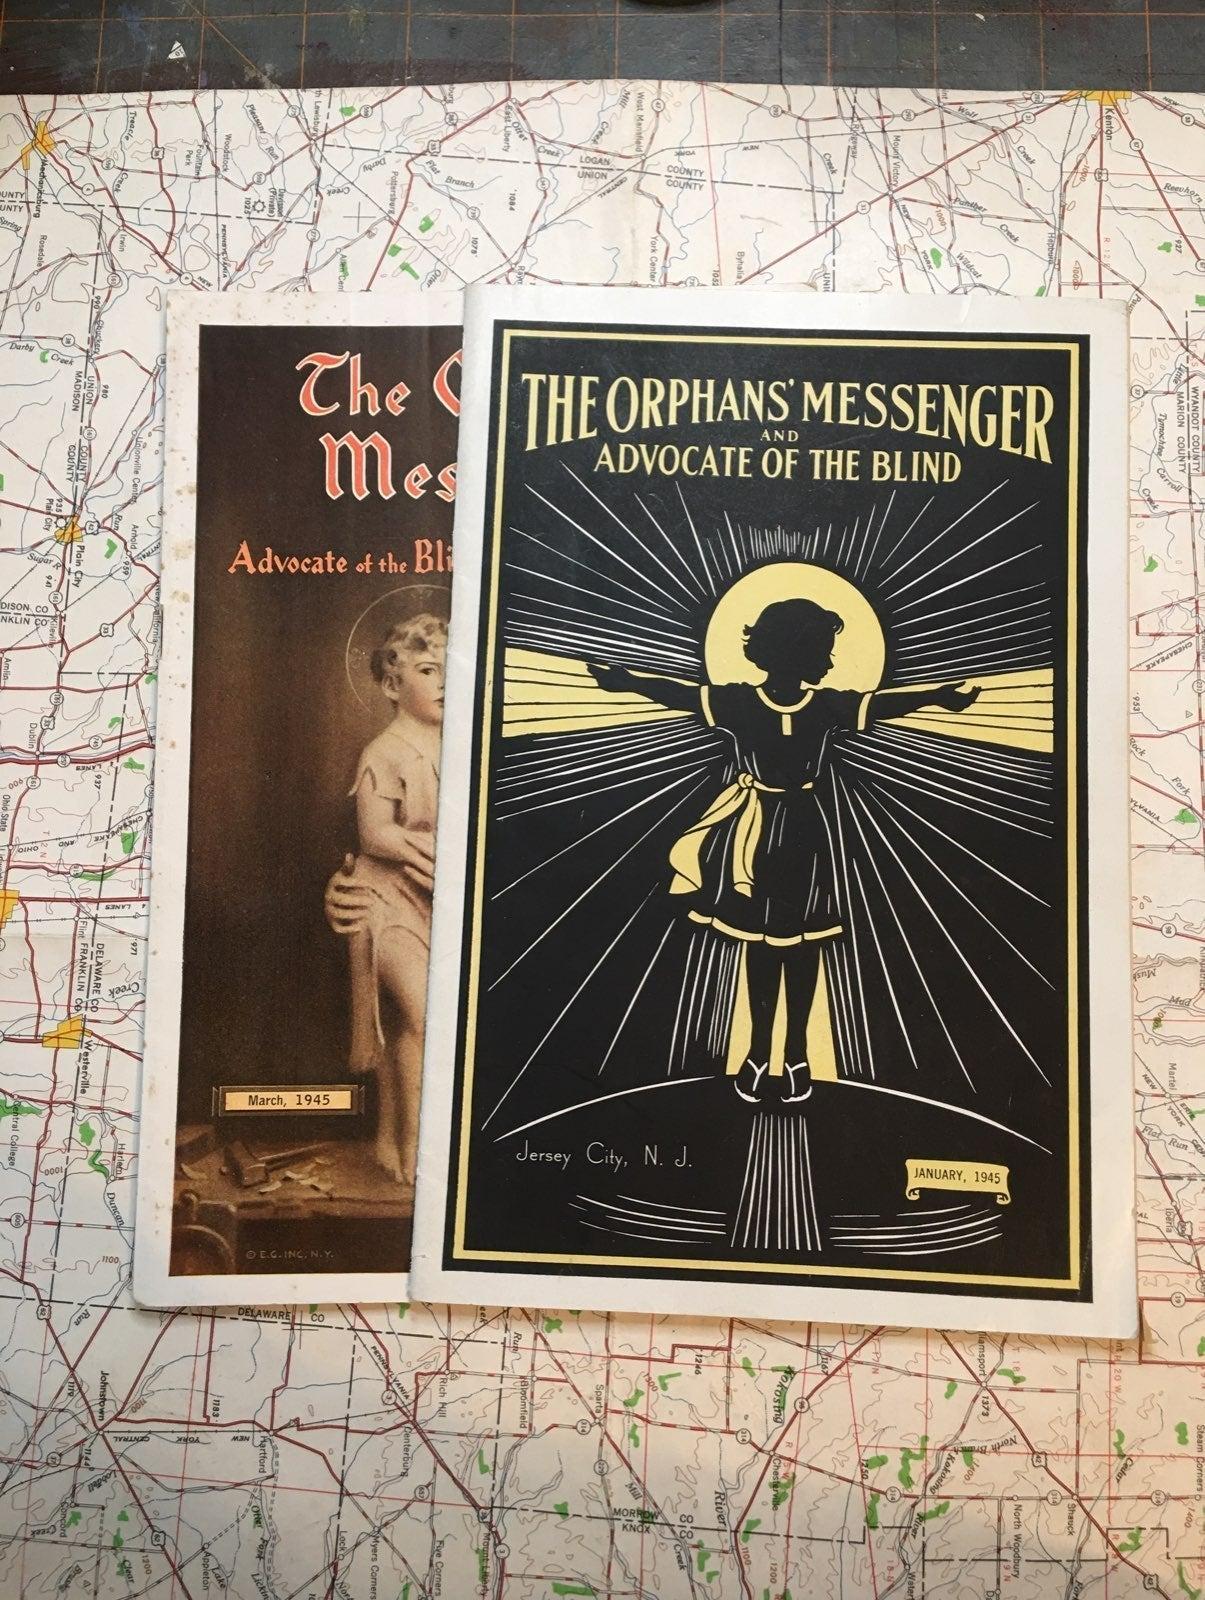 2 1945 The Orphans' Messenger Magazine